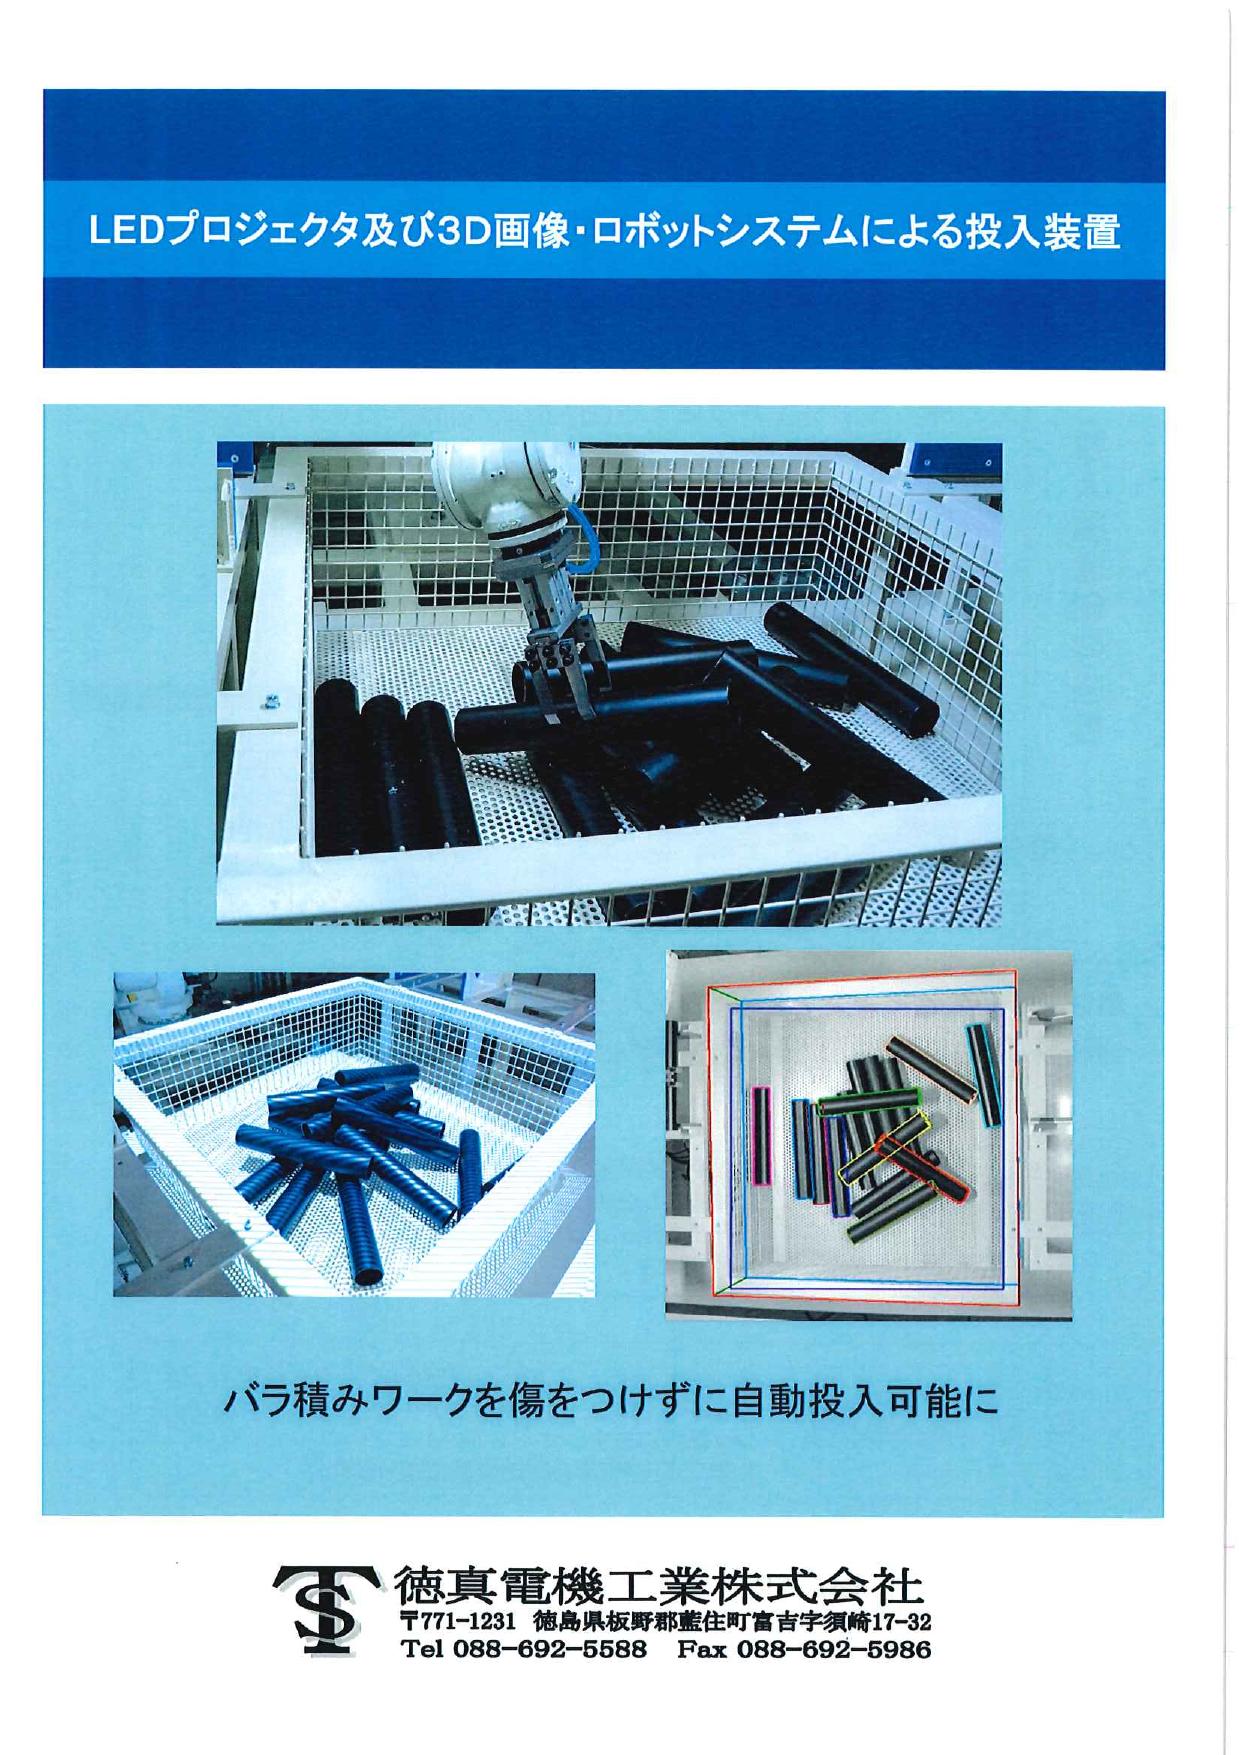 LEDプロジェクタ及び3D画像・ロボットシステムによる投入装置